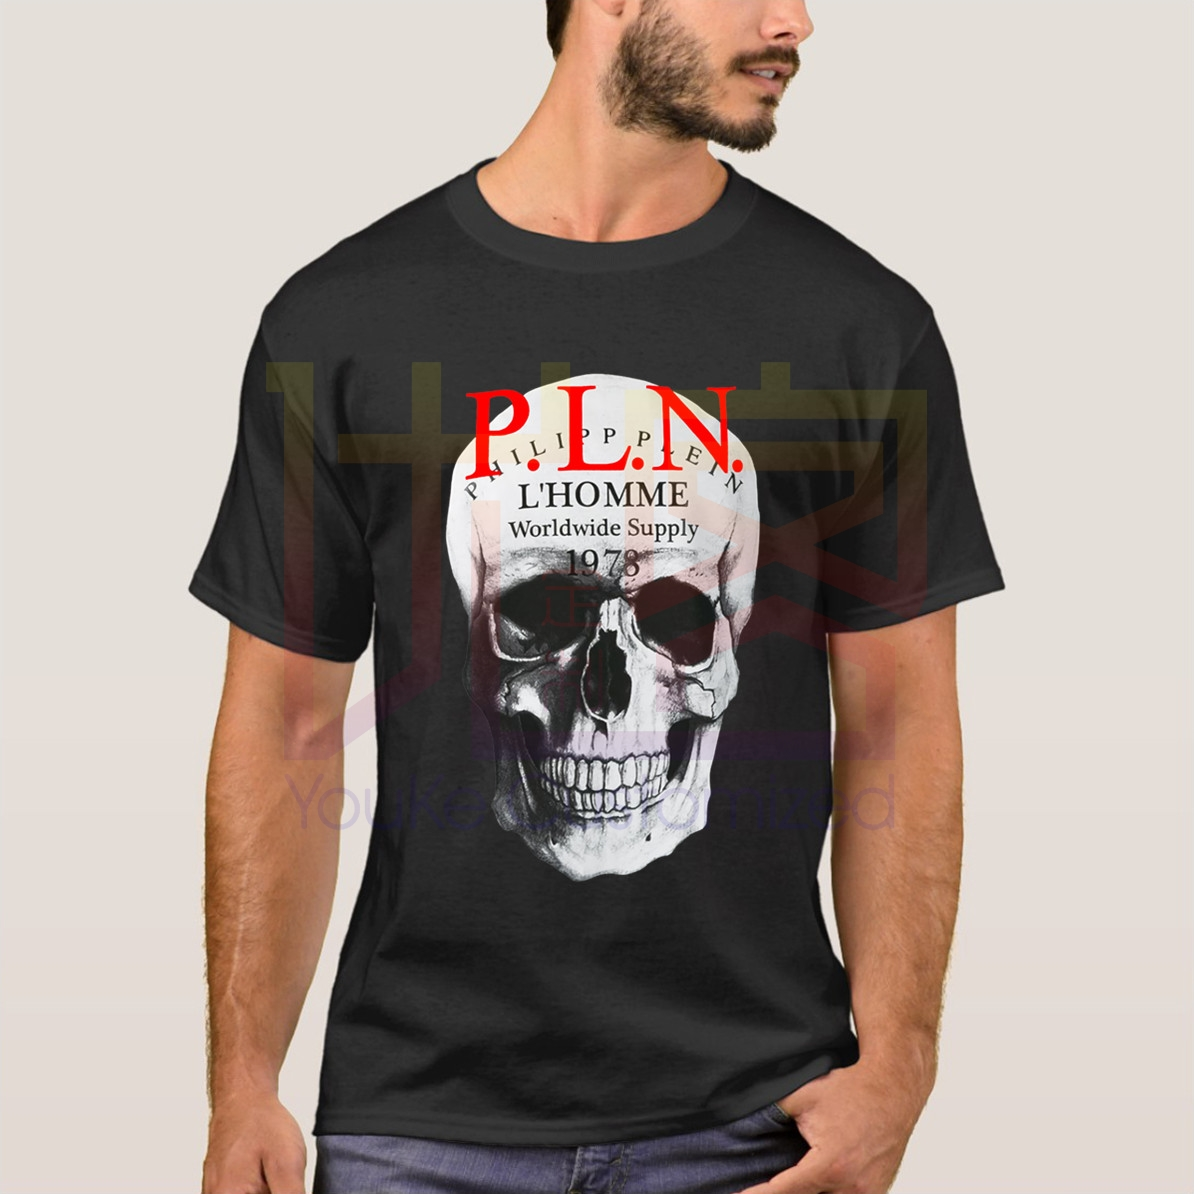 Retro Phillip Plein T-shirt Cotton Graphic Shirt Unoficial Stone-Island T-Shirt Hip Hop Novelty Men Brand Clothing T Shirt